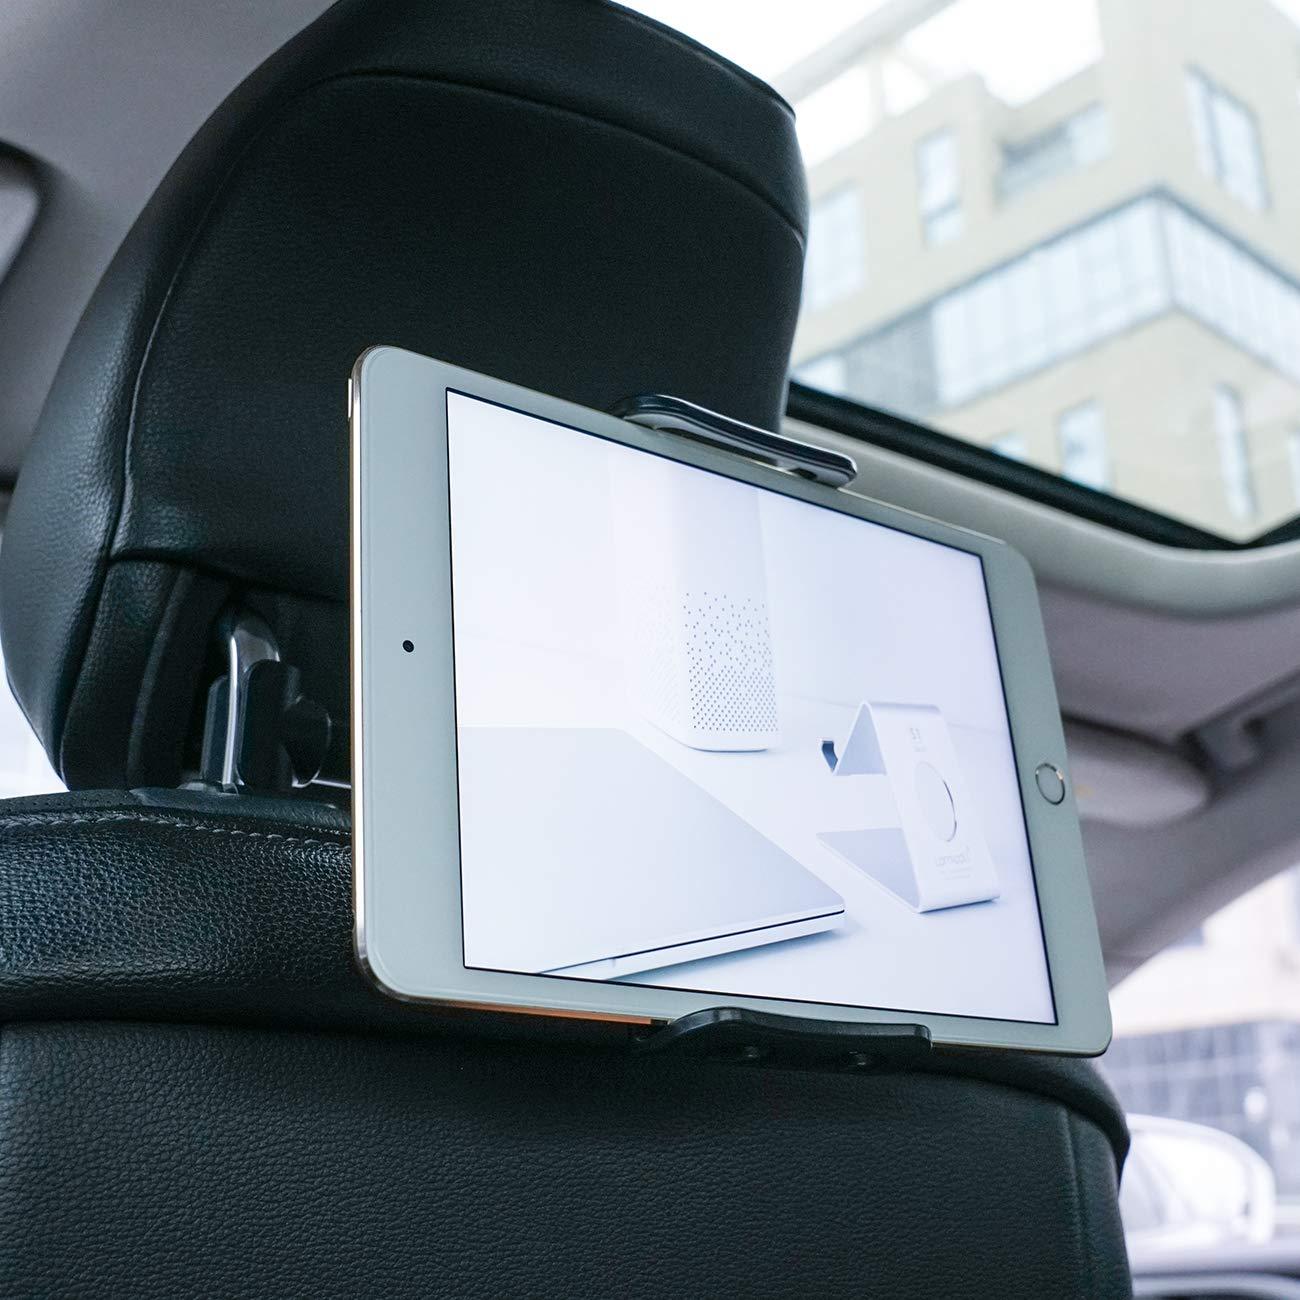 Lamicall Tablet Halterung Auto, Universal Tablet Halterung : KFZ-Kopfstü tzen Halterung fü r Pad Air Mini 2 3 4, Pad 2018 Pro 9.7, 10.5, Tab, E-Reader, Smartphone und Tablet mit 4.4~11 Zoll - Schwarz P-EU-BB